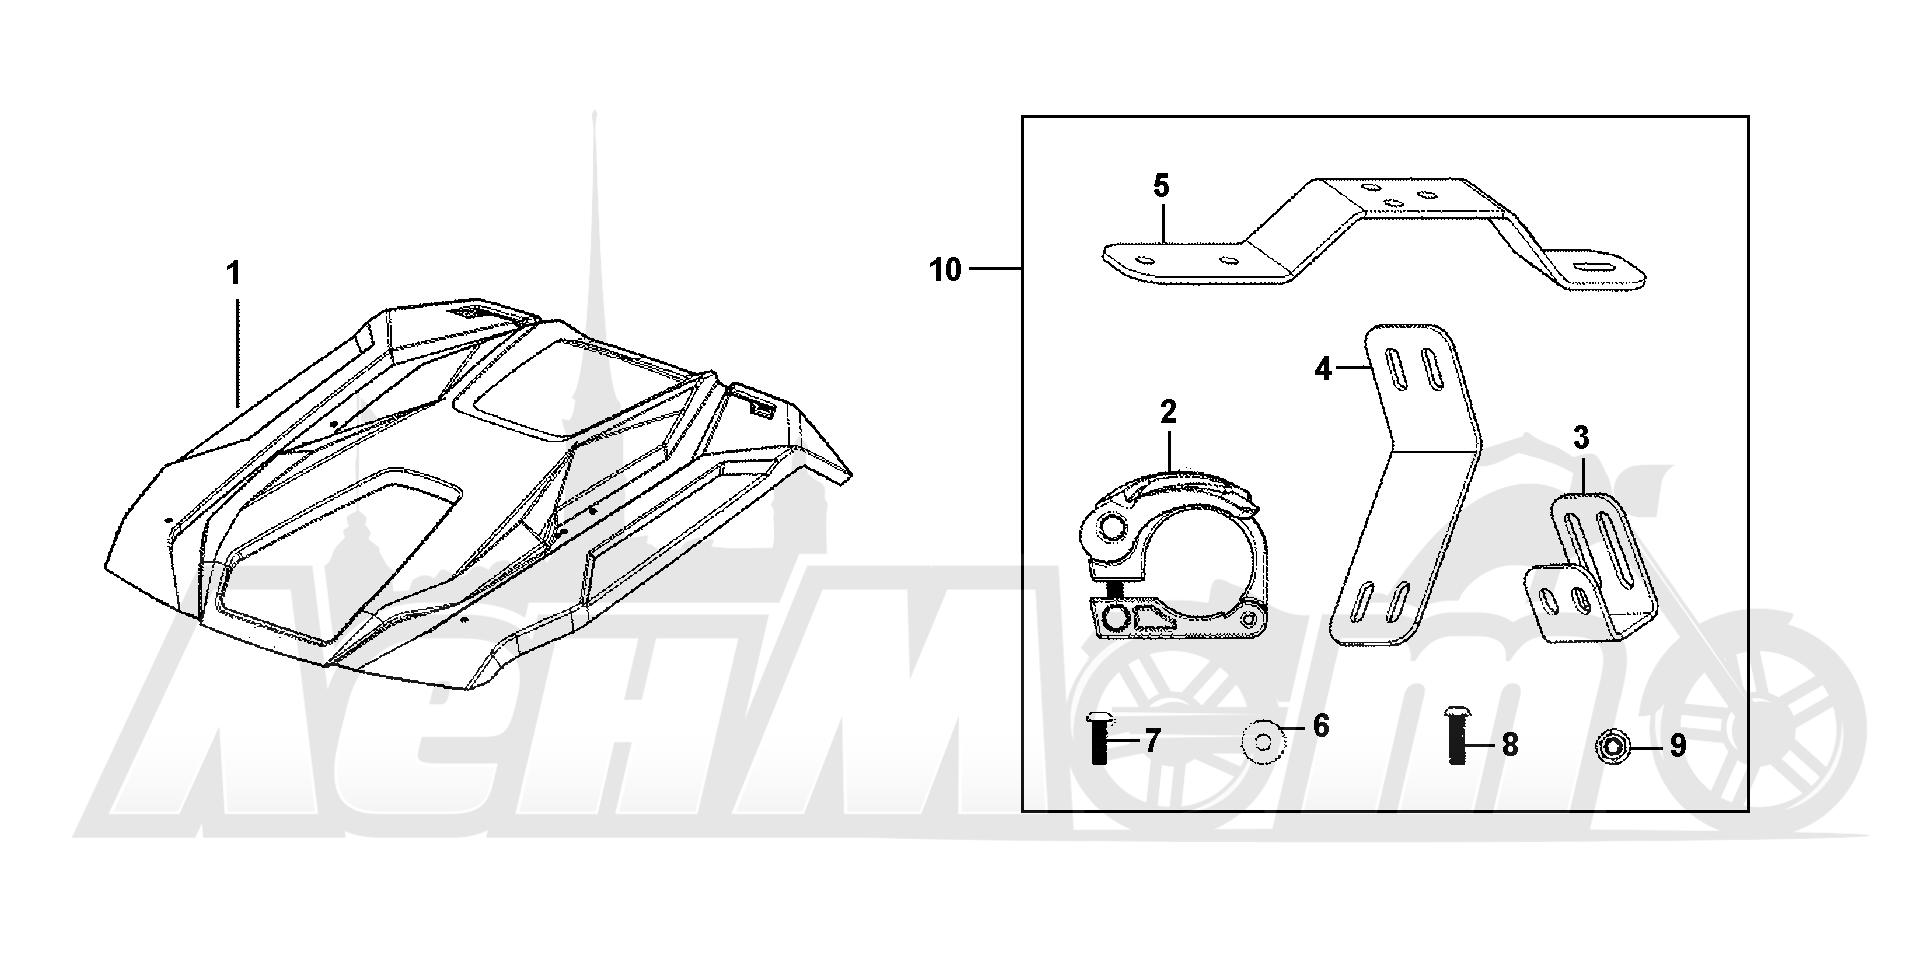 Запчасти для Квадроцикла Honda 2019 SXS1000M5L Раздел: HARD ROOF (5P) | HARD крыша (5P)